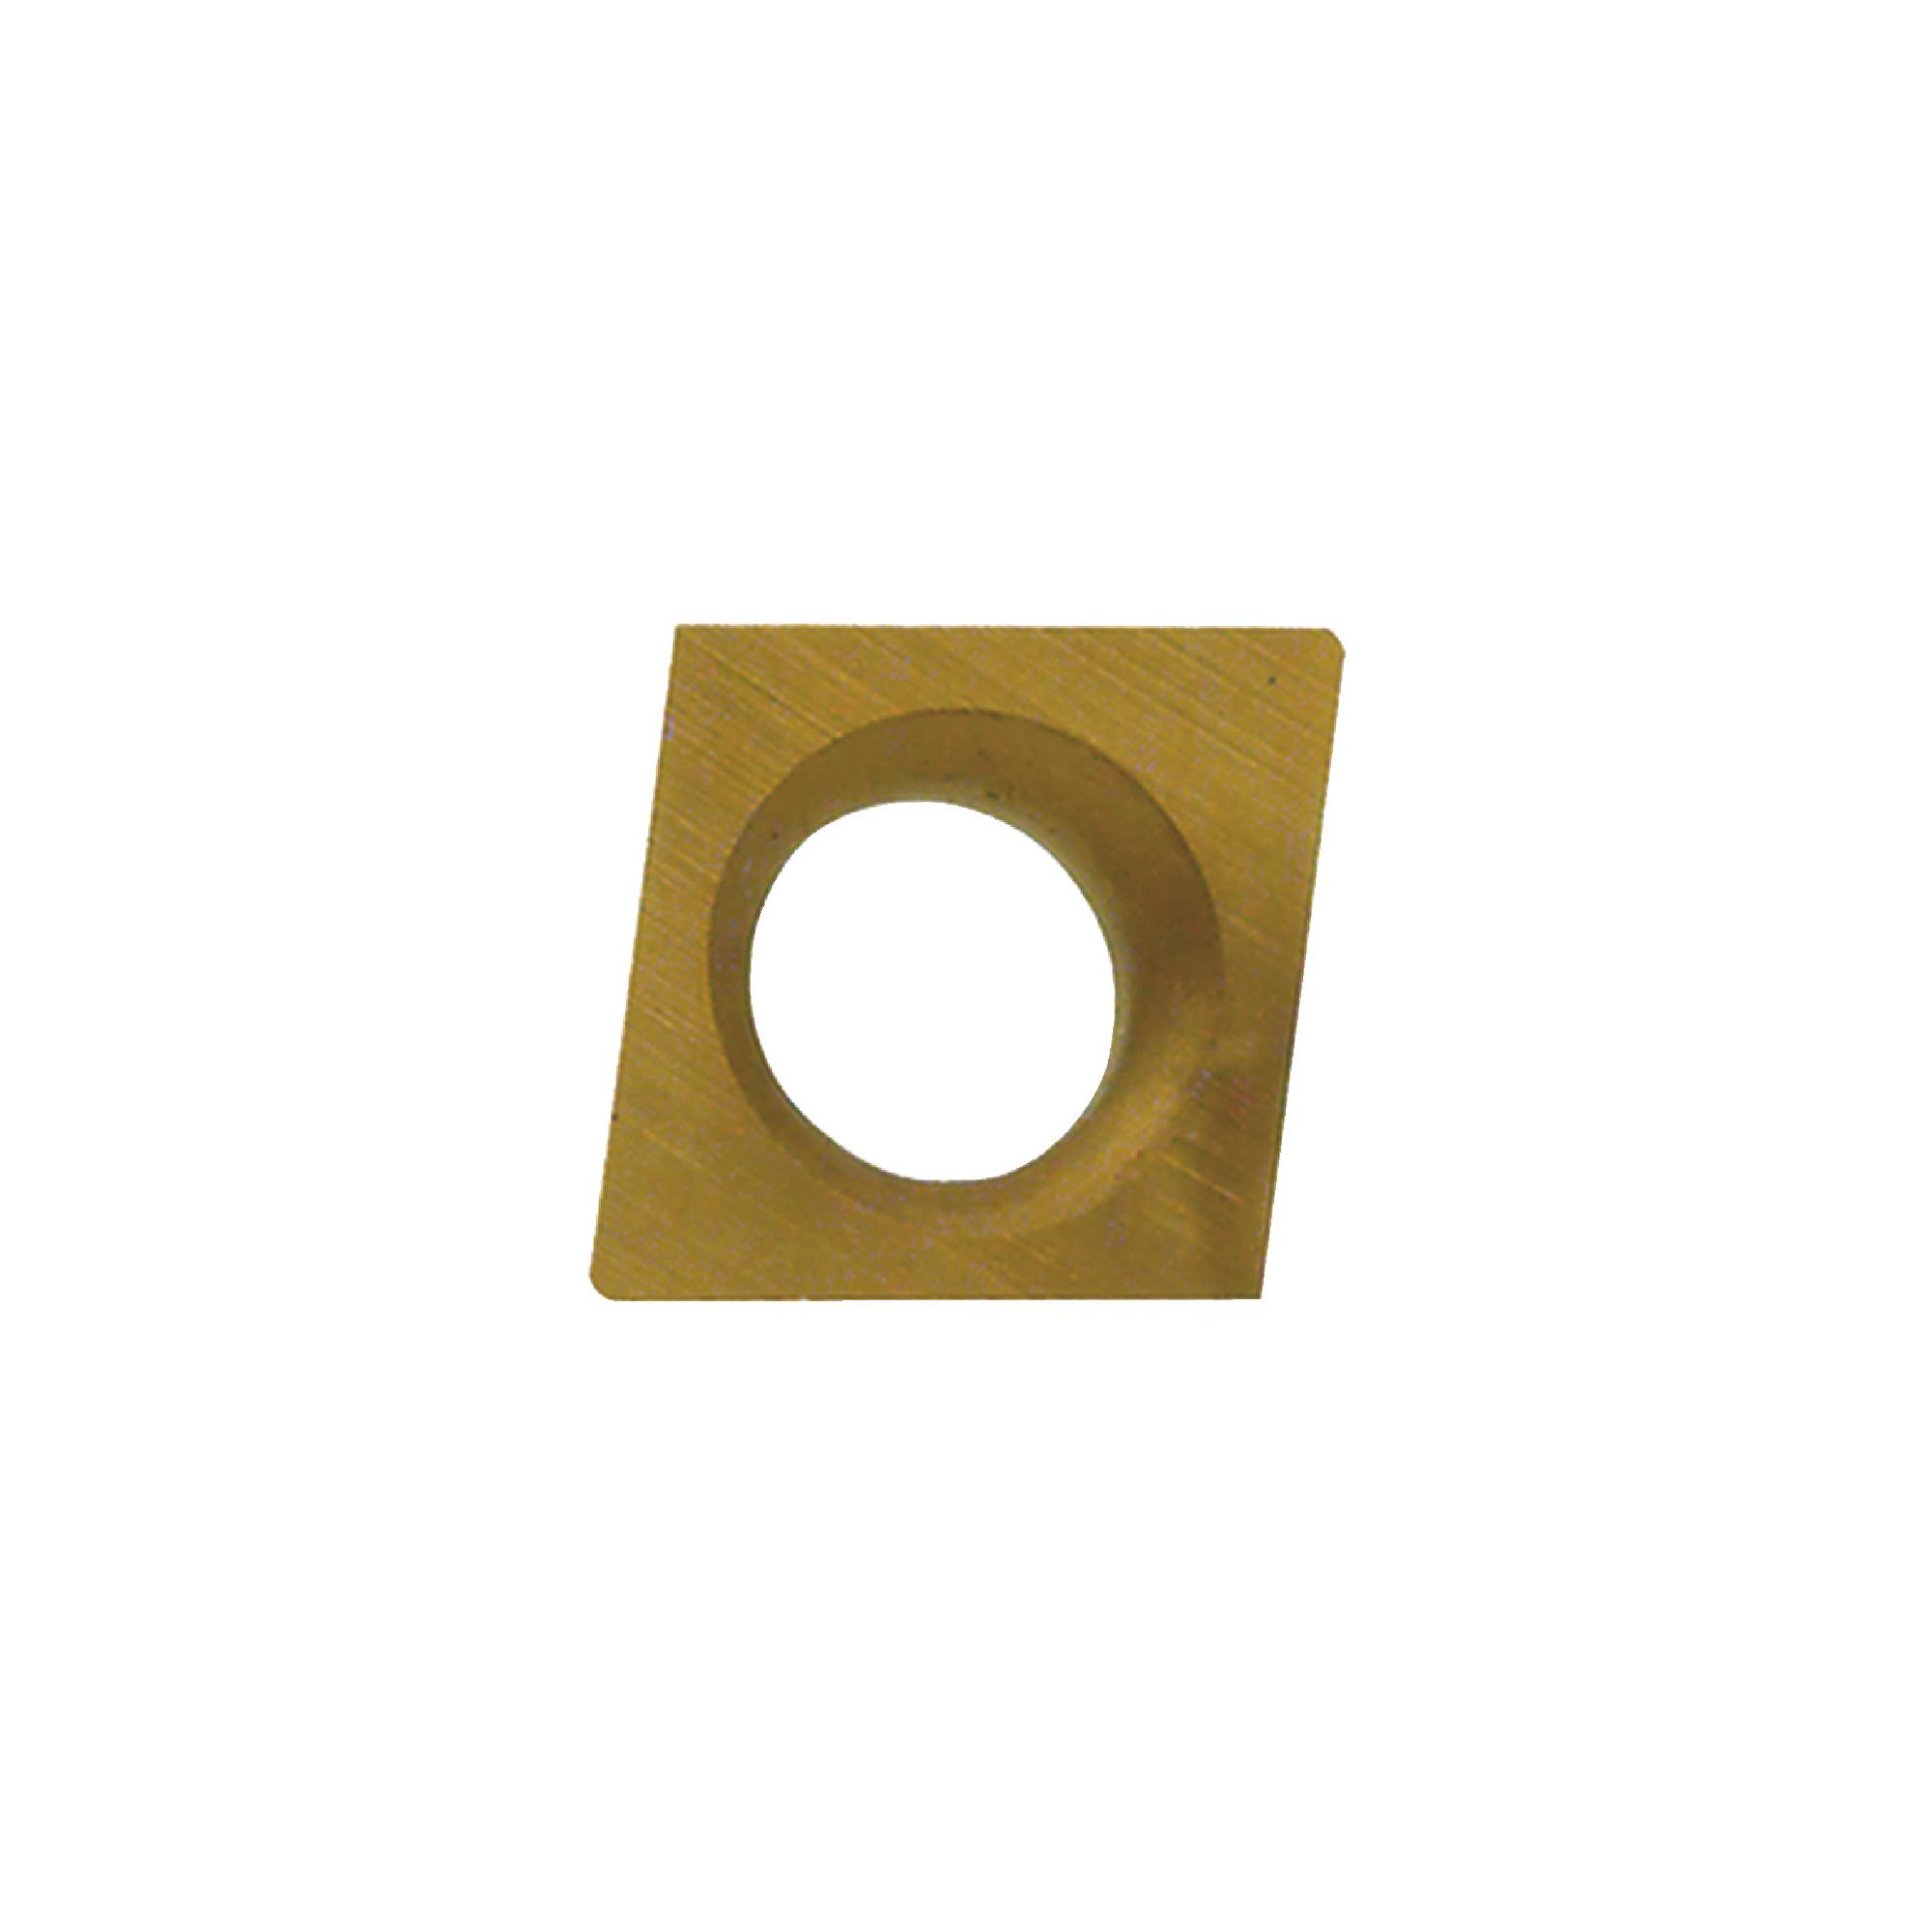 EVEREDE - CDCD-07 CS2 - 80° Diamond / Indexable Carbide Turning Insert